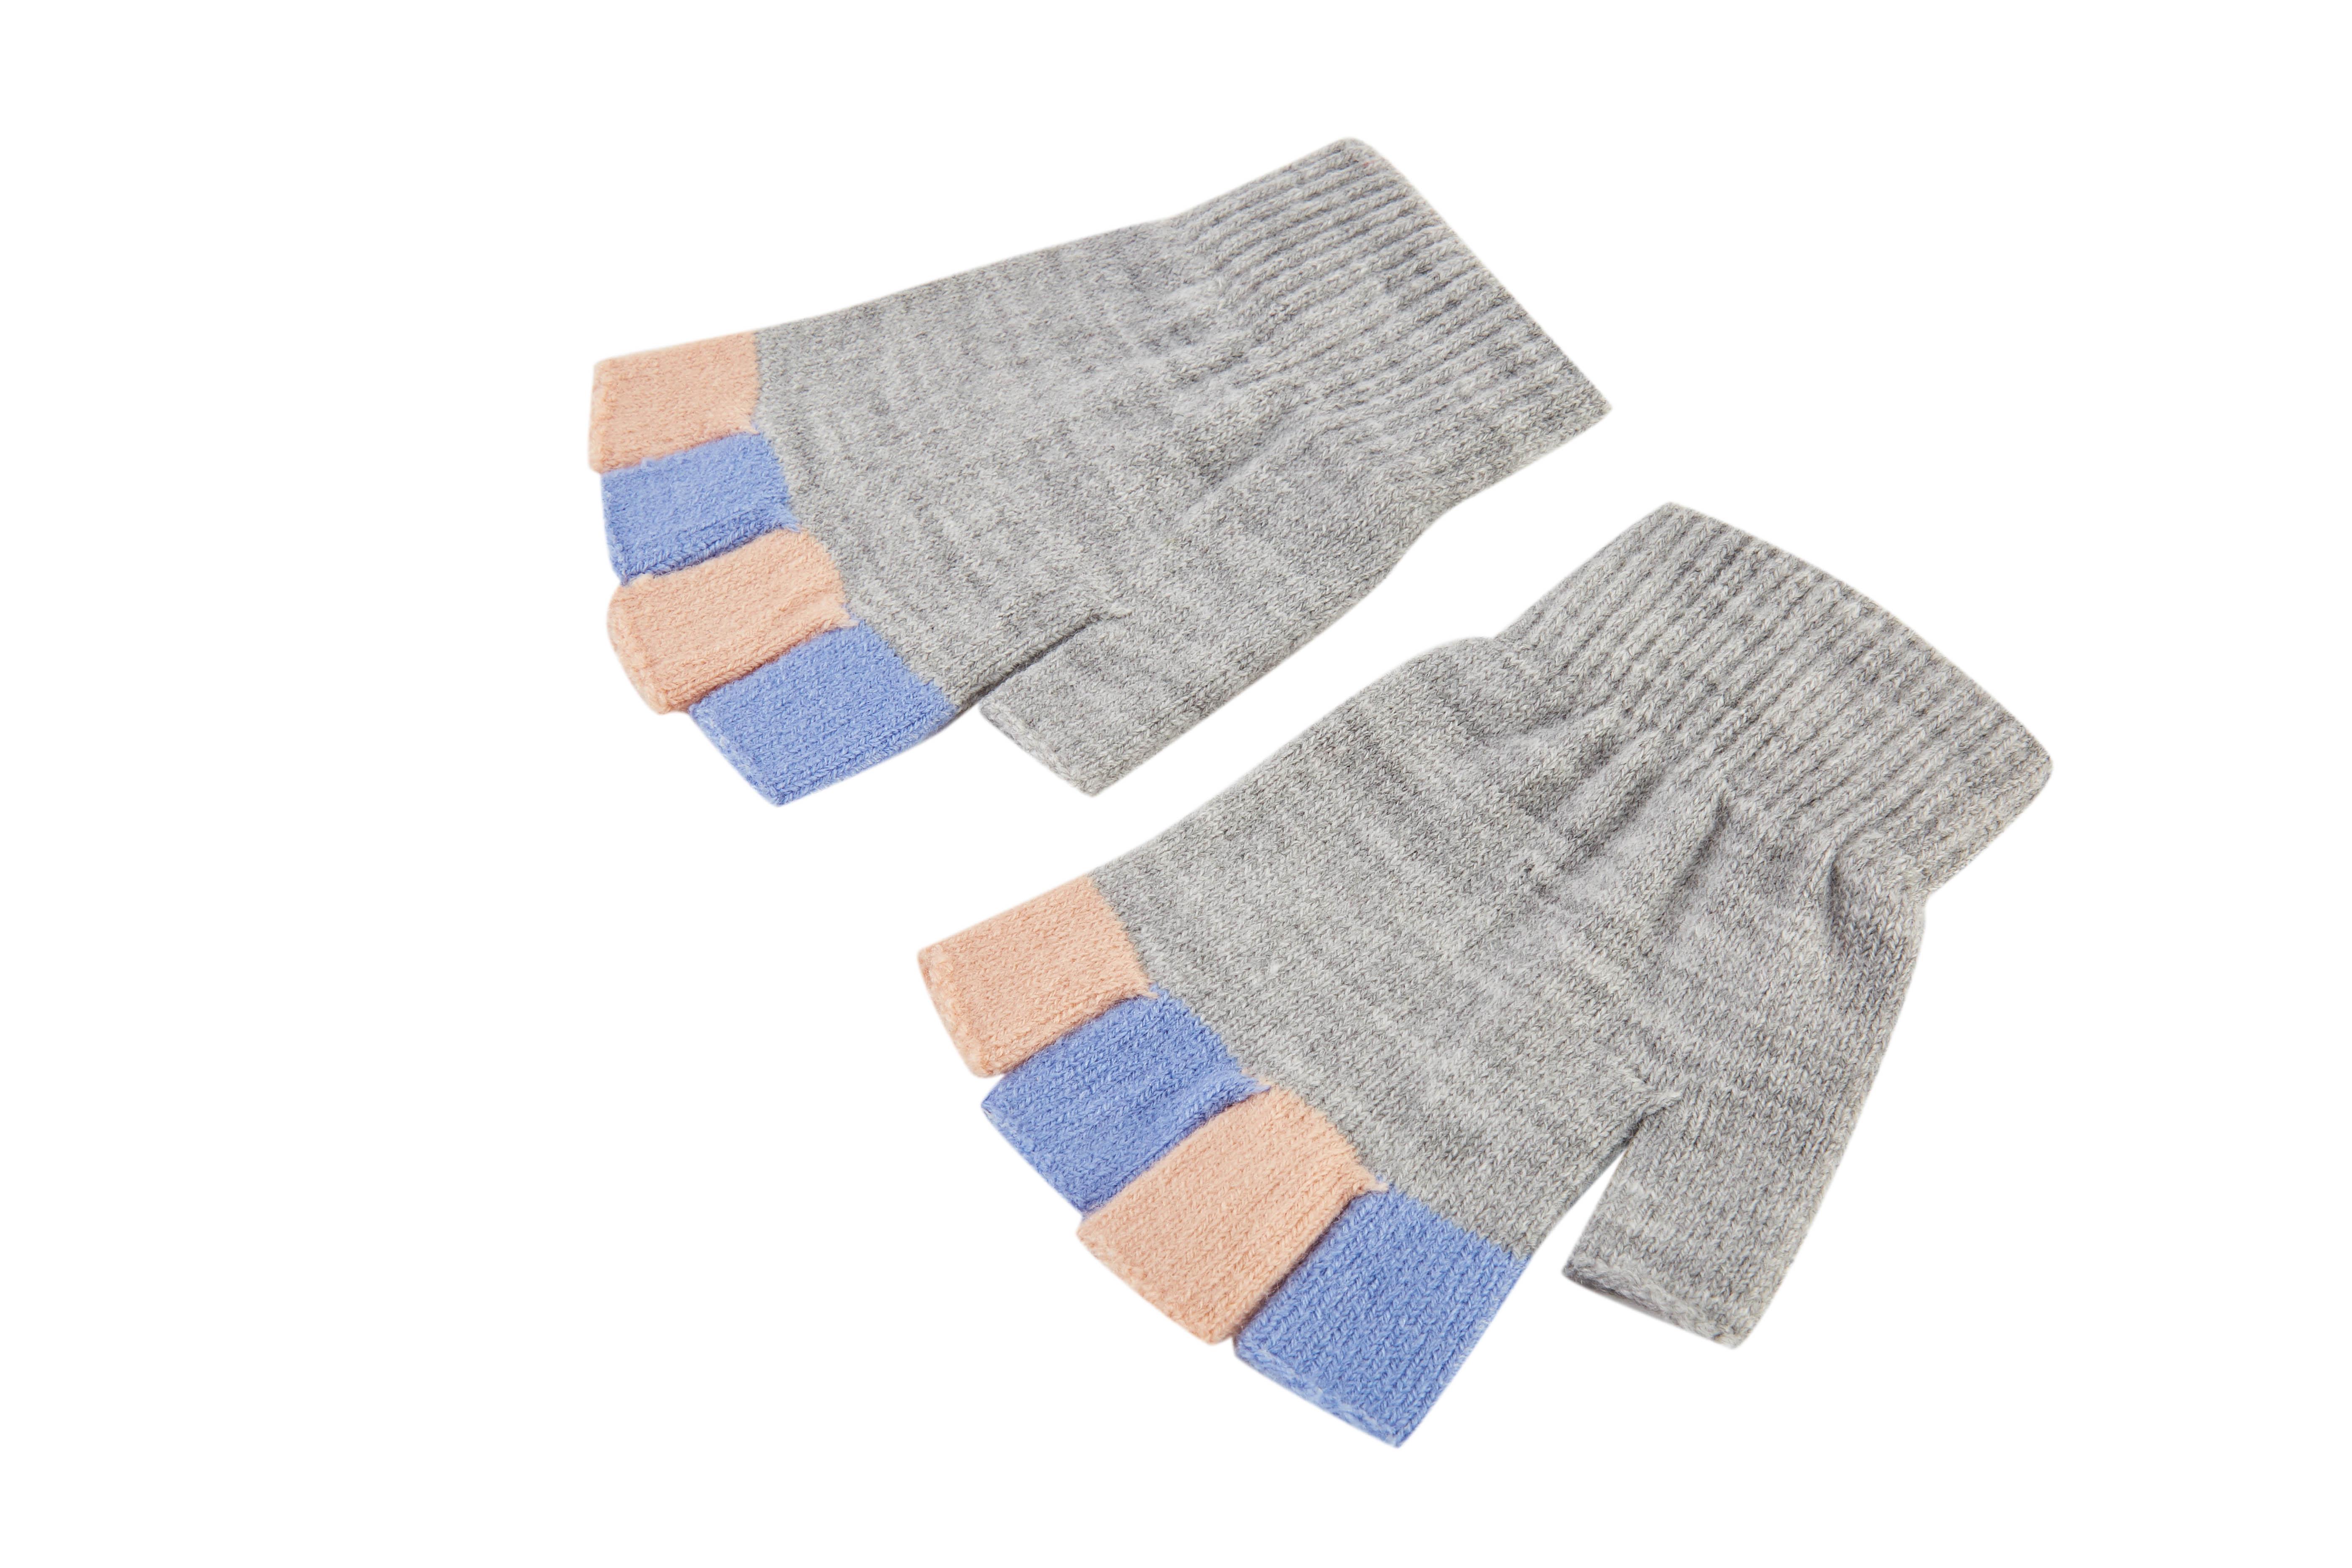 Kids' Fingerless Gloves Student Winter Knit Mittens